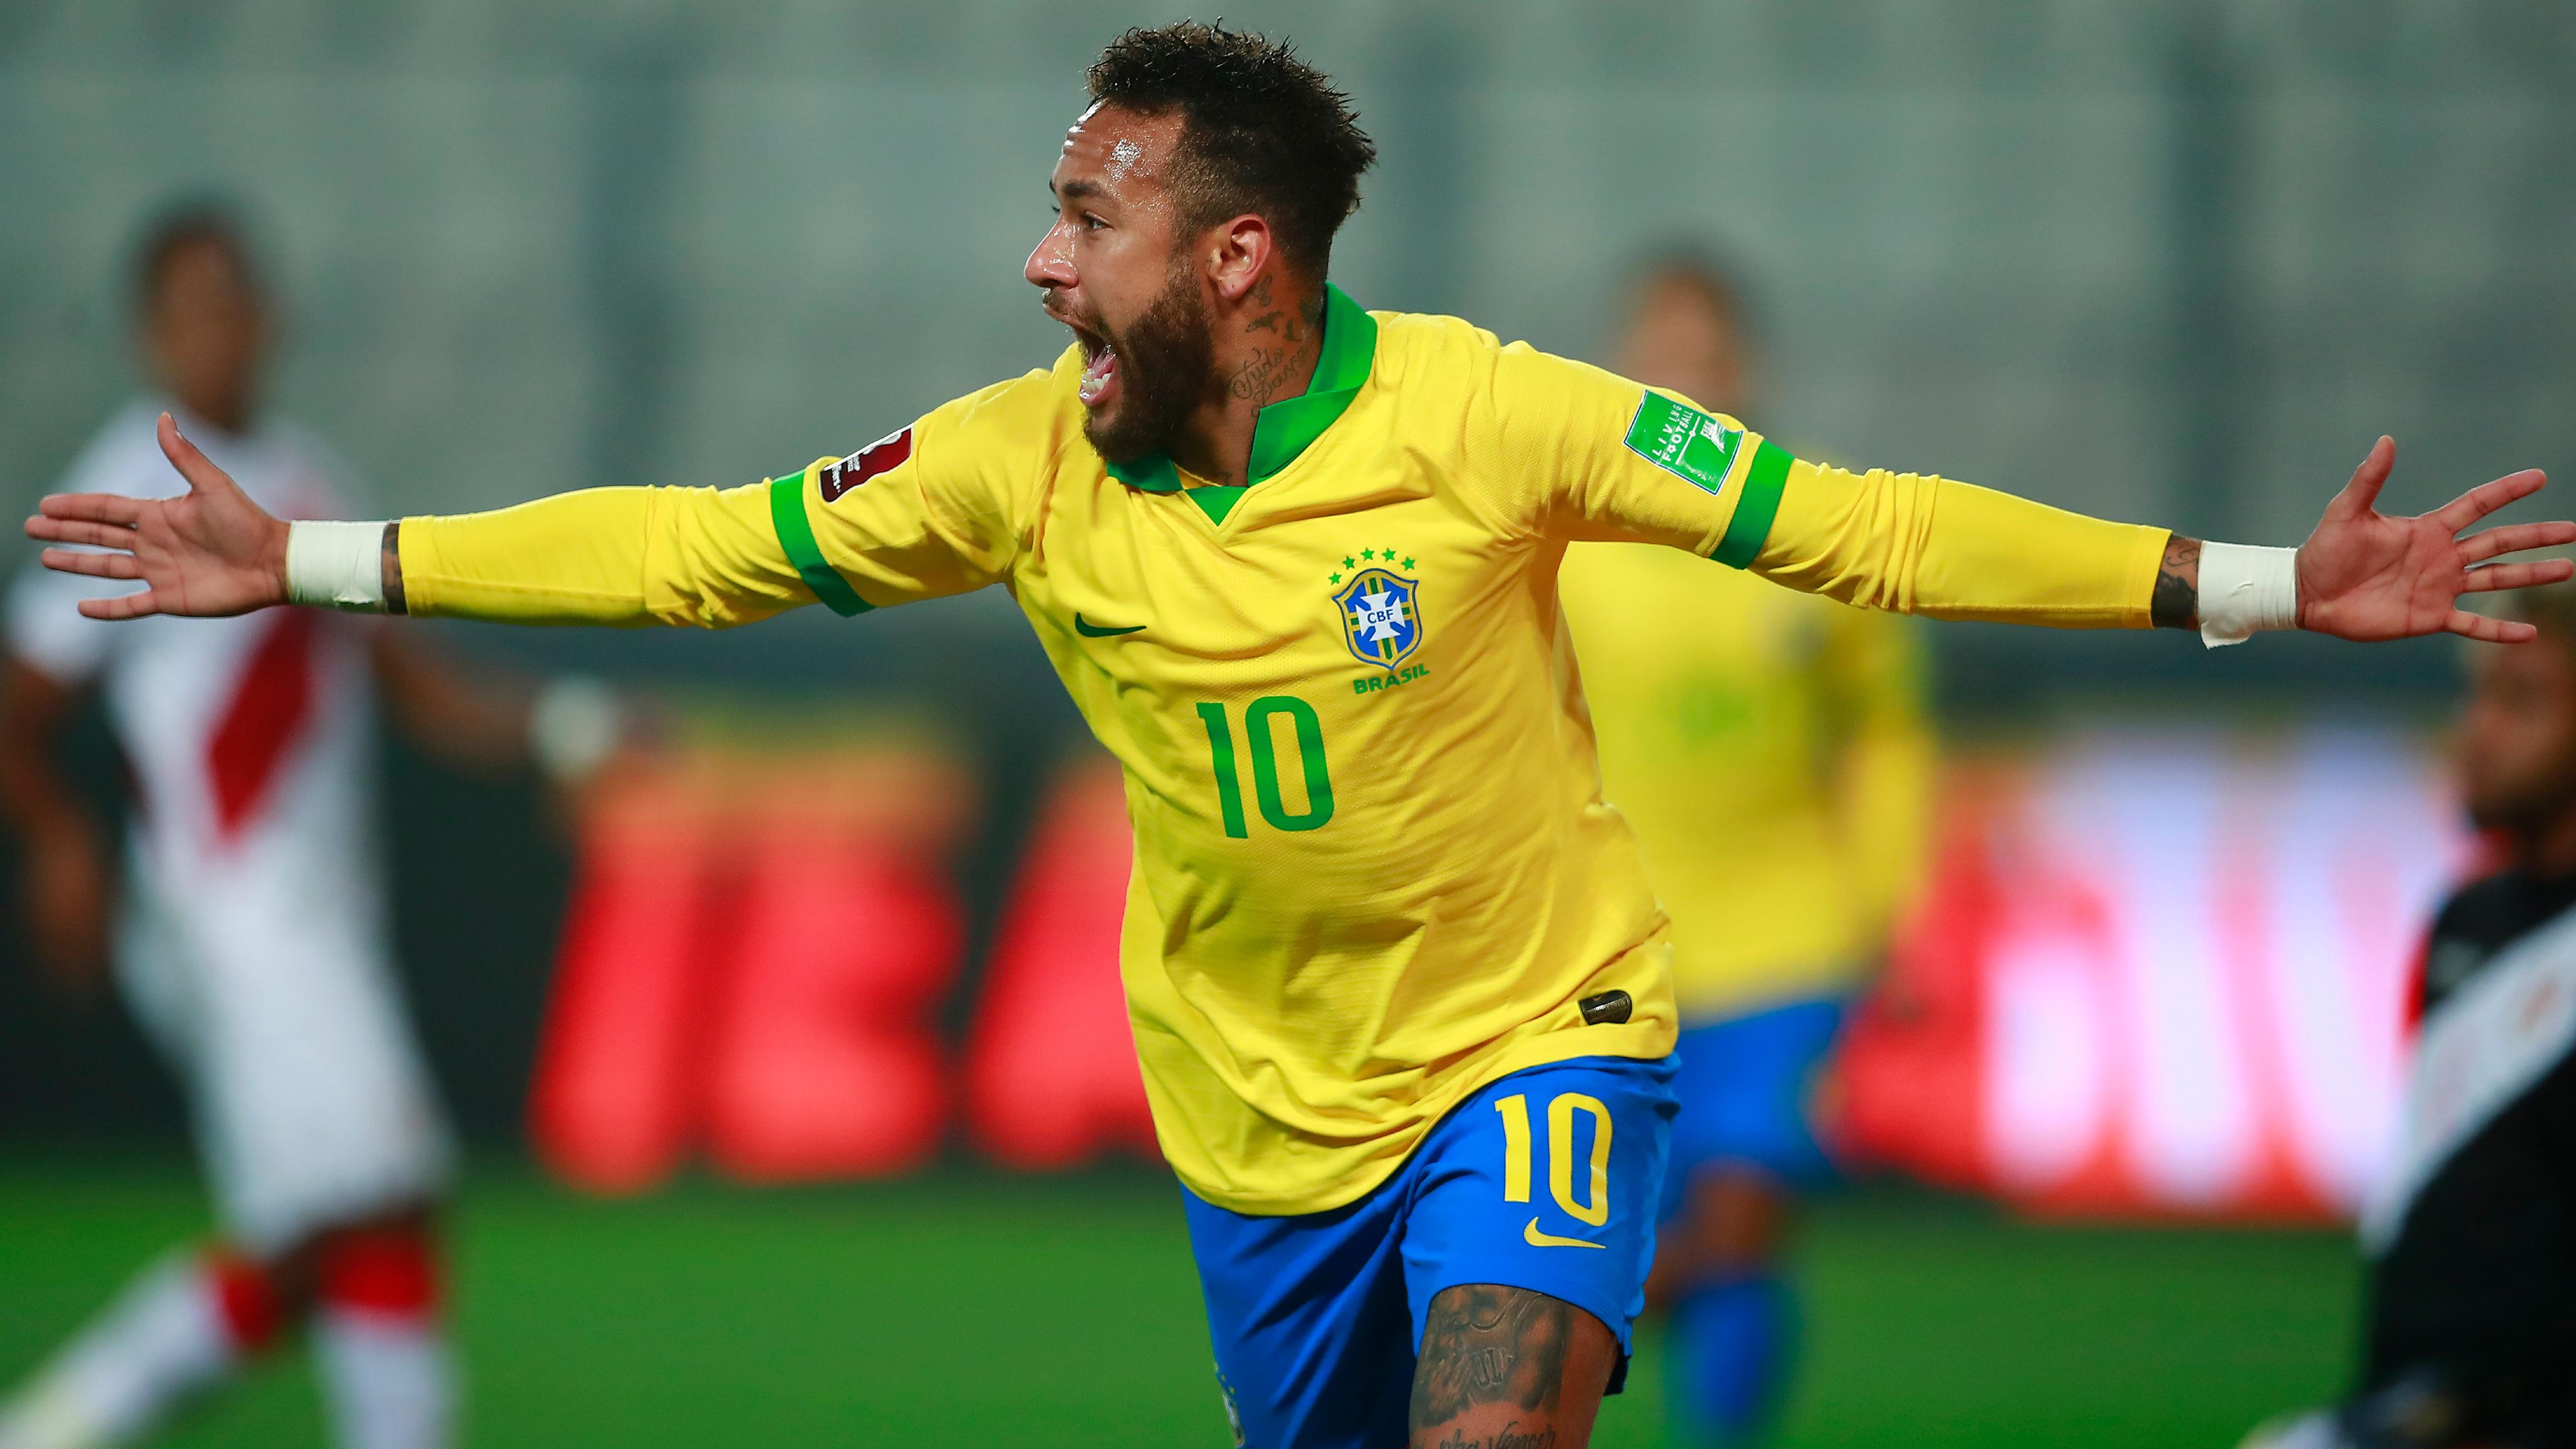 Peru 2-4 Brazil: Neymar passes Ronaldo with hat-trick